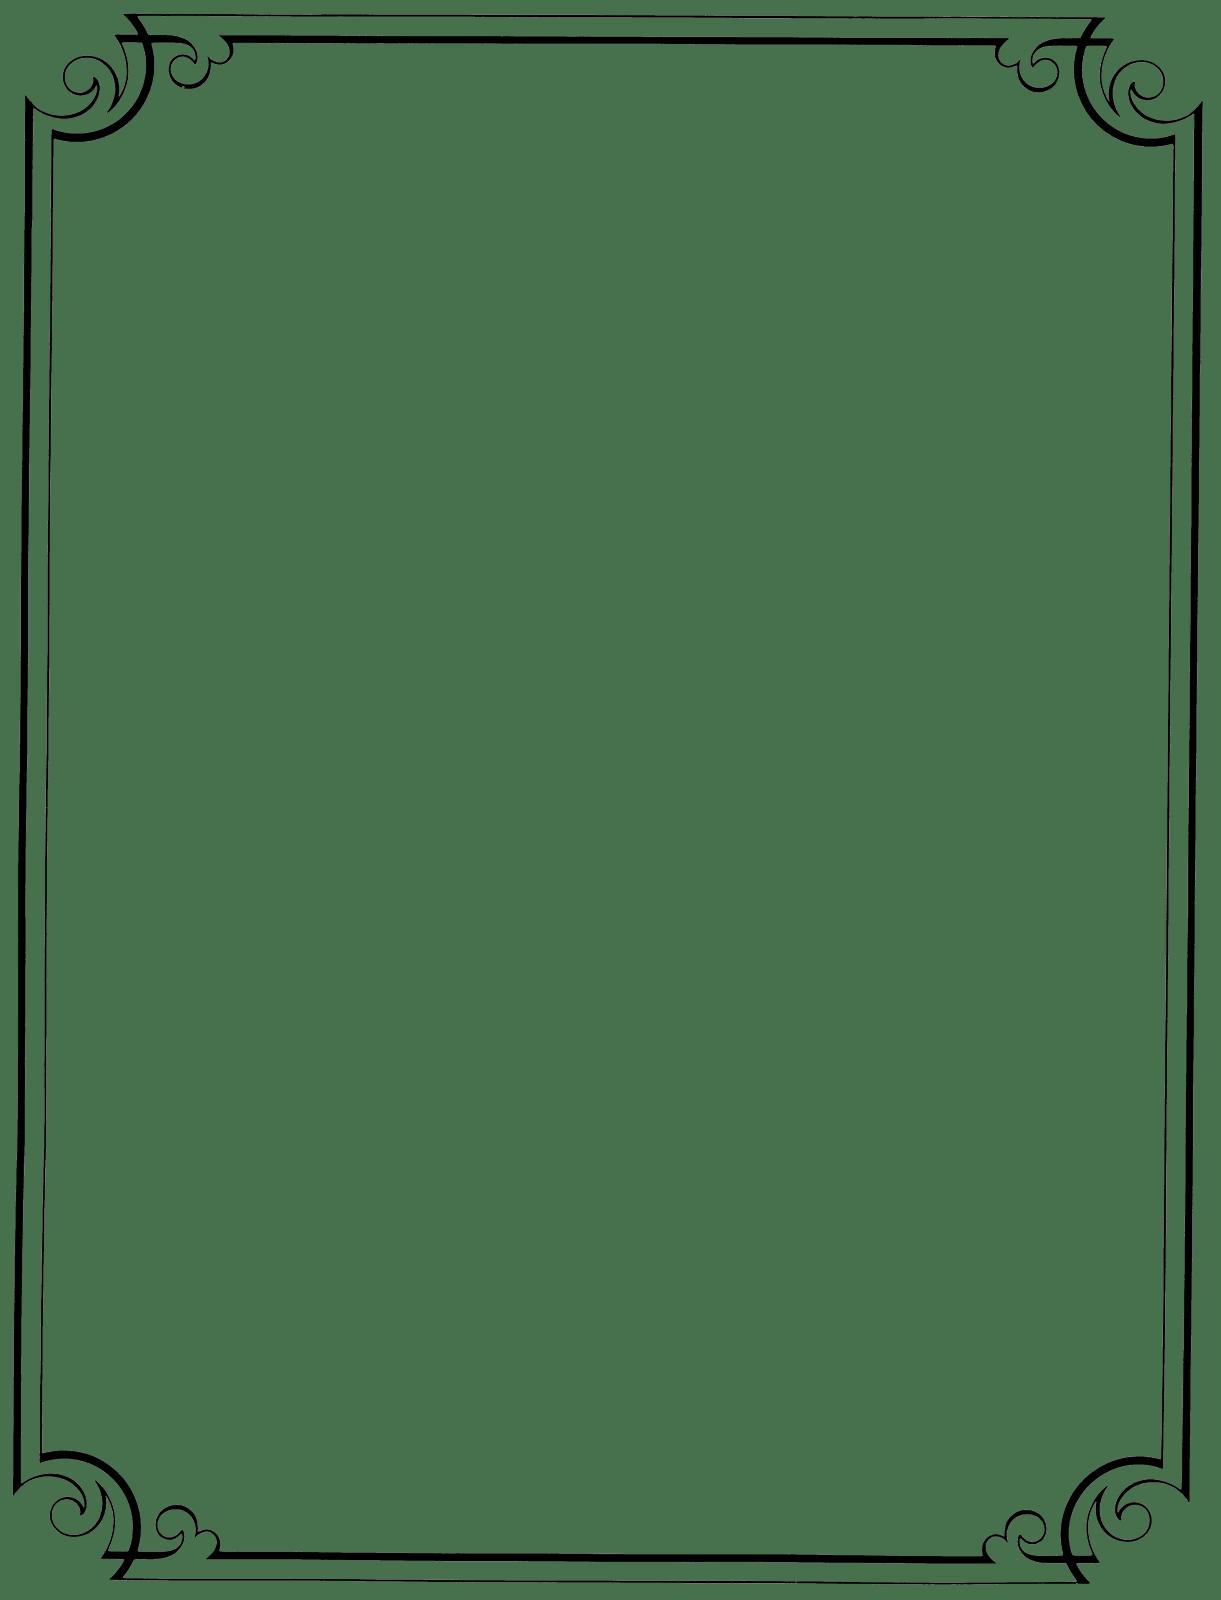 Page Borders Design